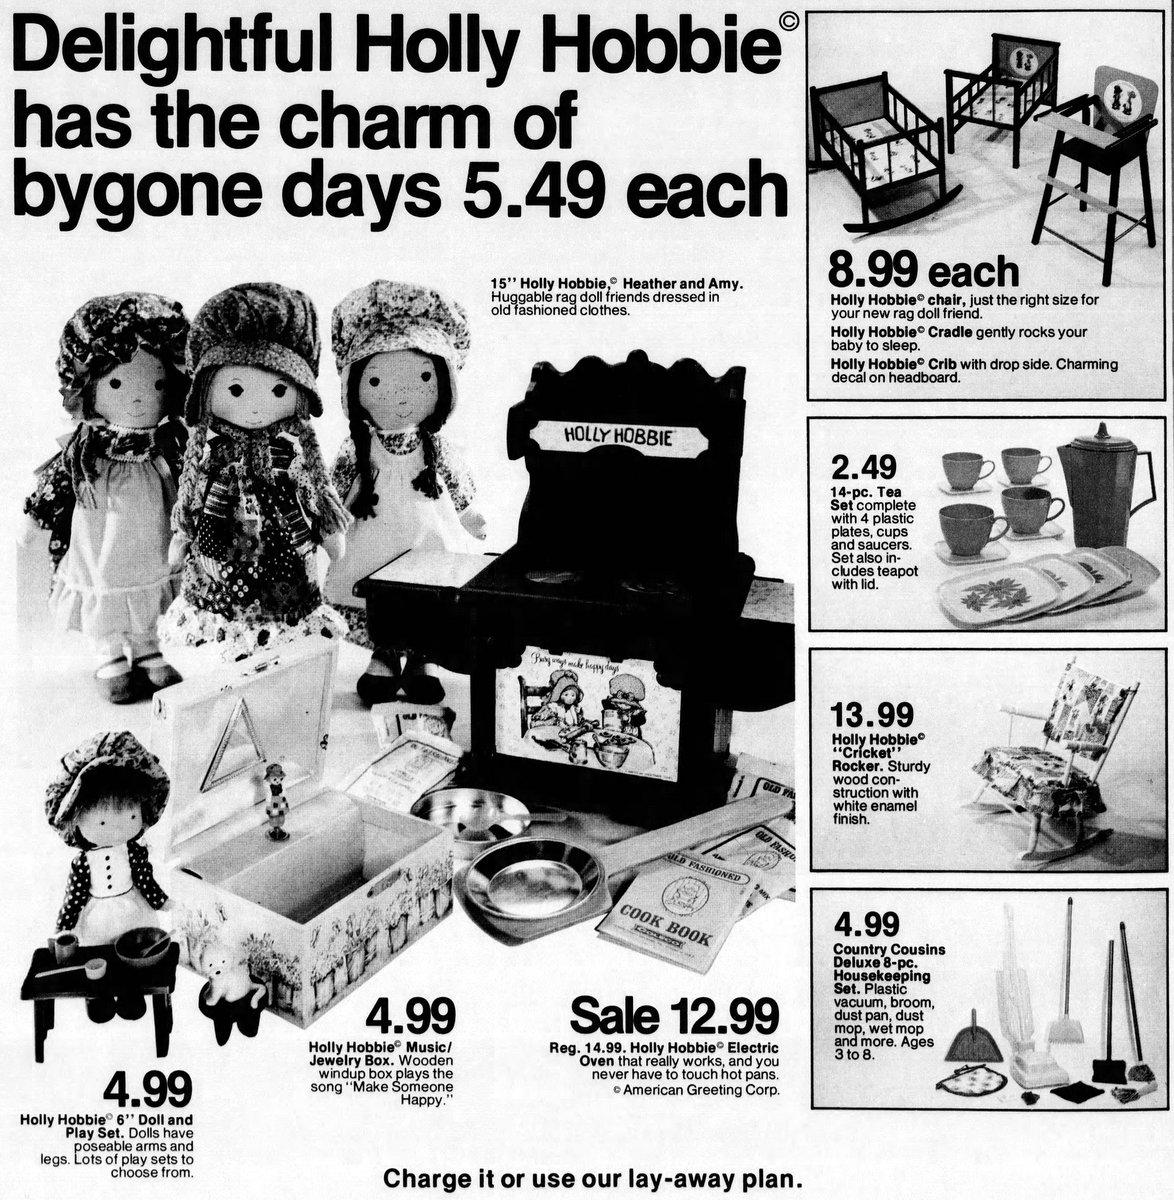 Delightful Holly Hobbie dolls and dollhouse (1976)